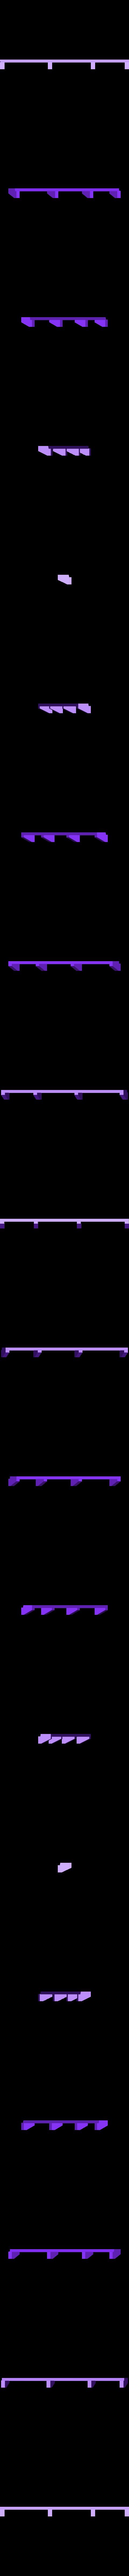 MirrorRun_Board_Back-A.STL Download free STL file 4-8-8-4 Big Boy Locomotive • 3D printer object, RaymondDeLuca